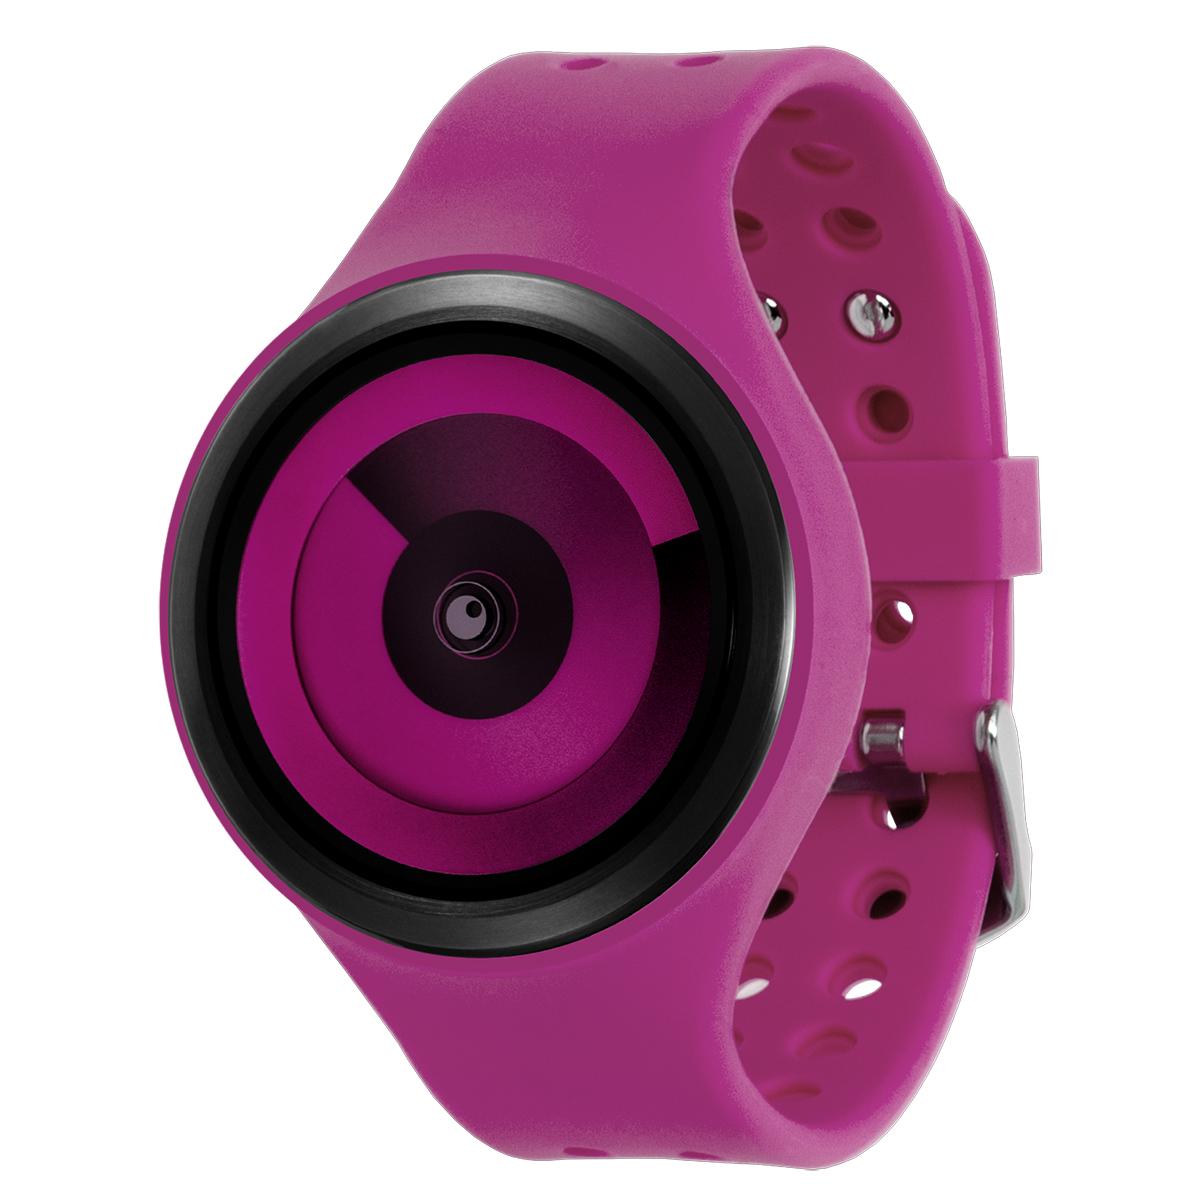 ZEROO SPIRAL GALAXY ゼロ 電池式クォーツ 腕時計 [W00603B03SR07] マゼンタ デザインウォッチ ペア用 メンズ レディース ユニセックス おしゃれ時計 デザイナーズ